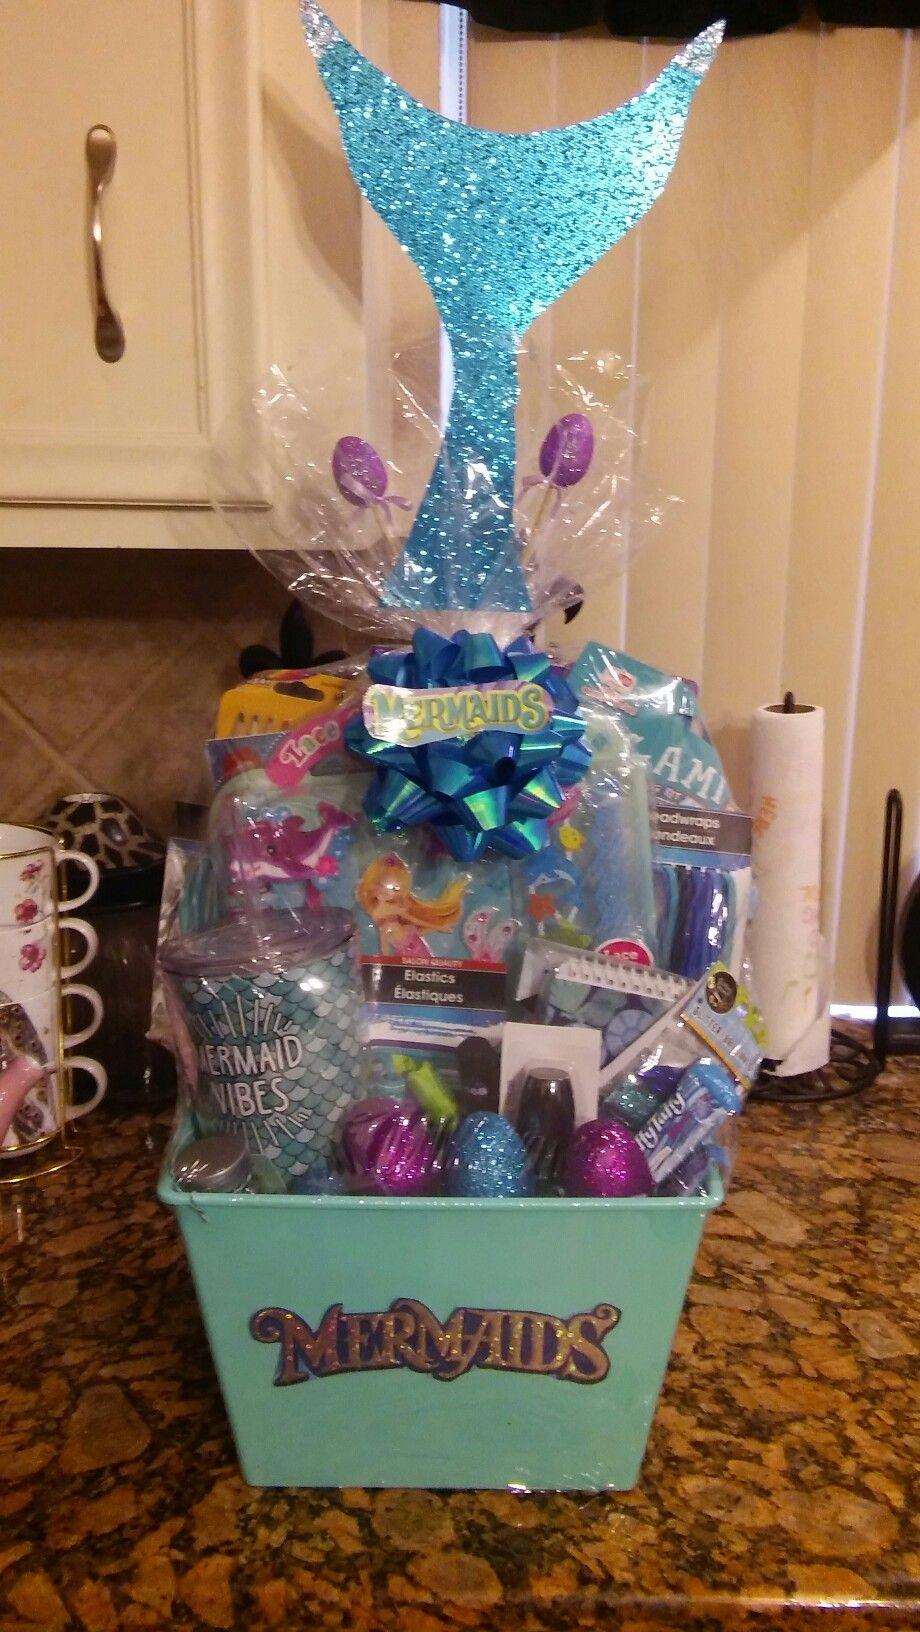 Mermaid easter basket gift baskets pinterest easter baskets mermaid easter basket negle Image collections